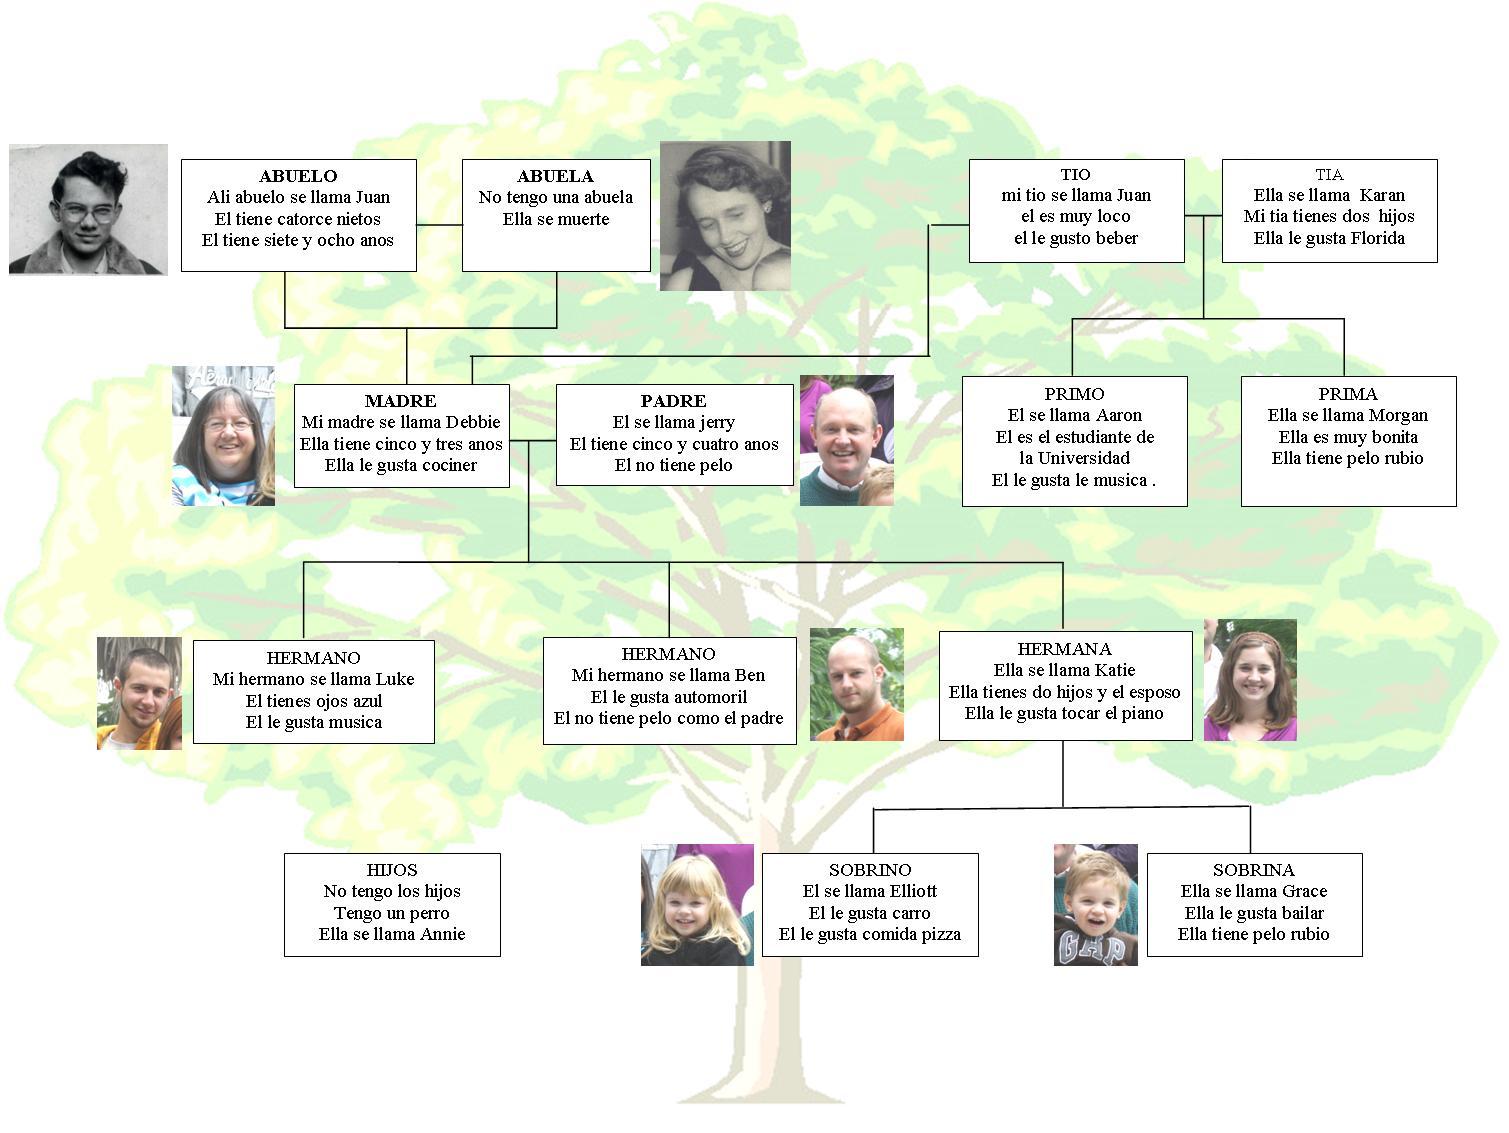 Pavlansky: Seth's Family Tree in Spanish